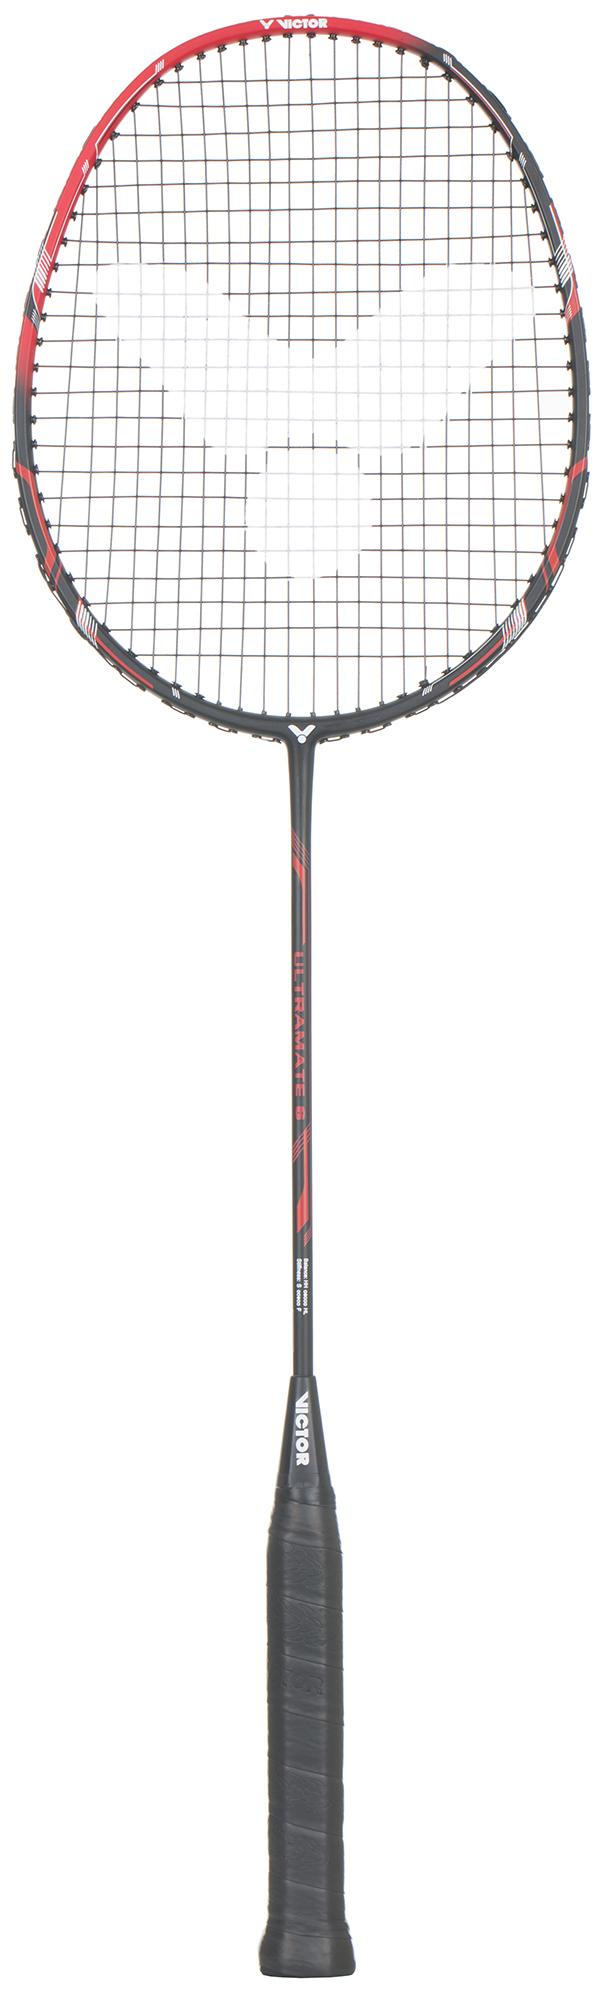 Victor Ракетка для бадминтона Victor Ultramate 6 ракетка для бадминтона sirdar 2020 x